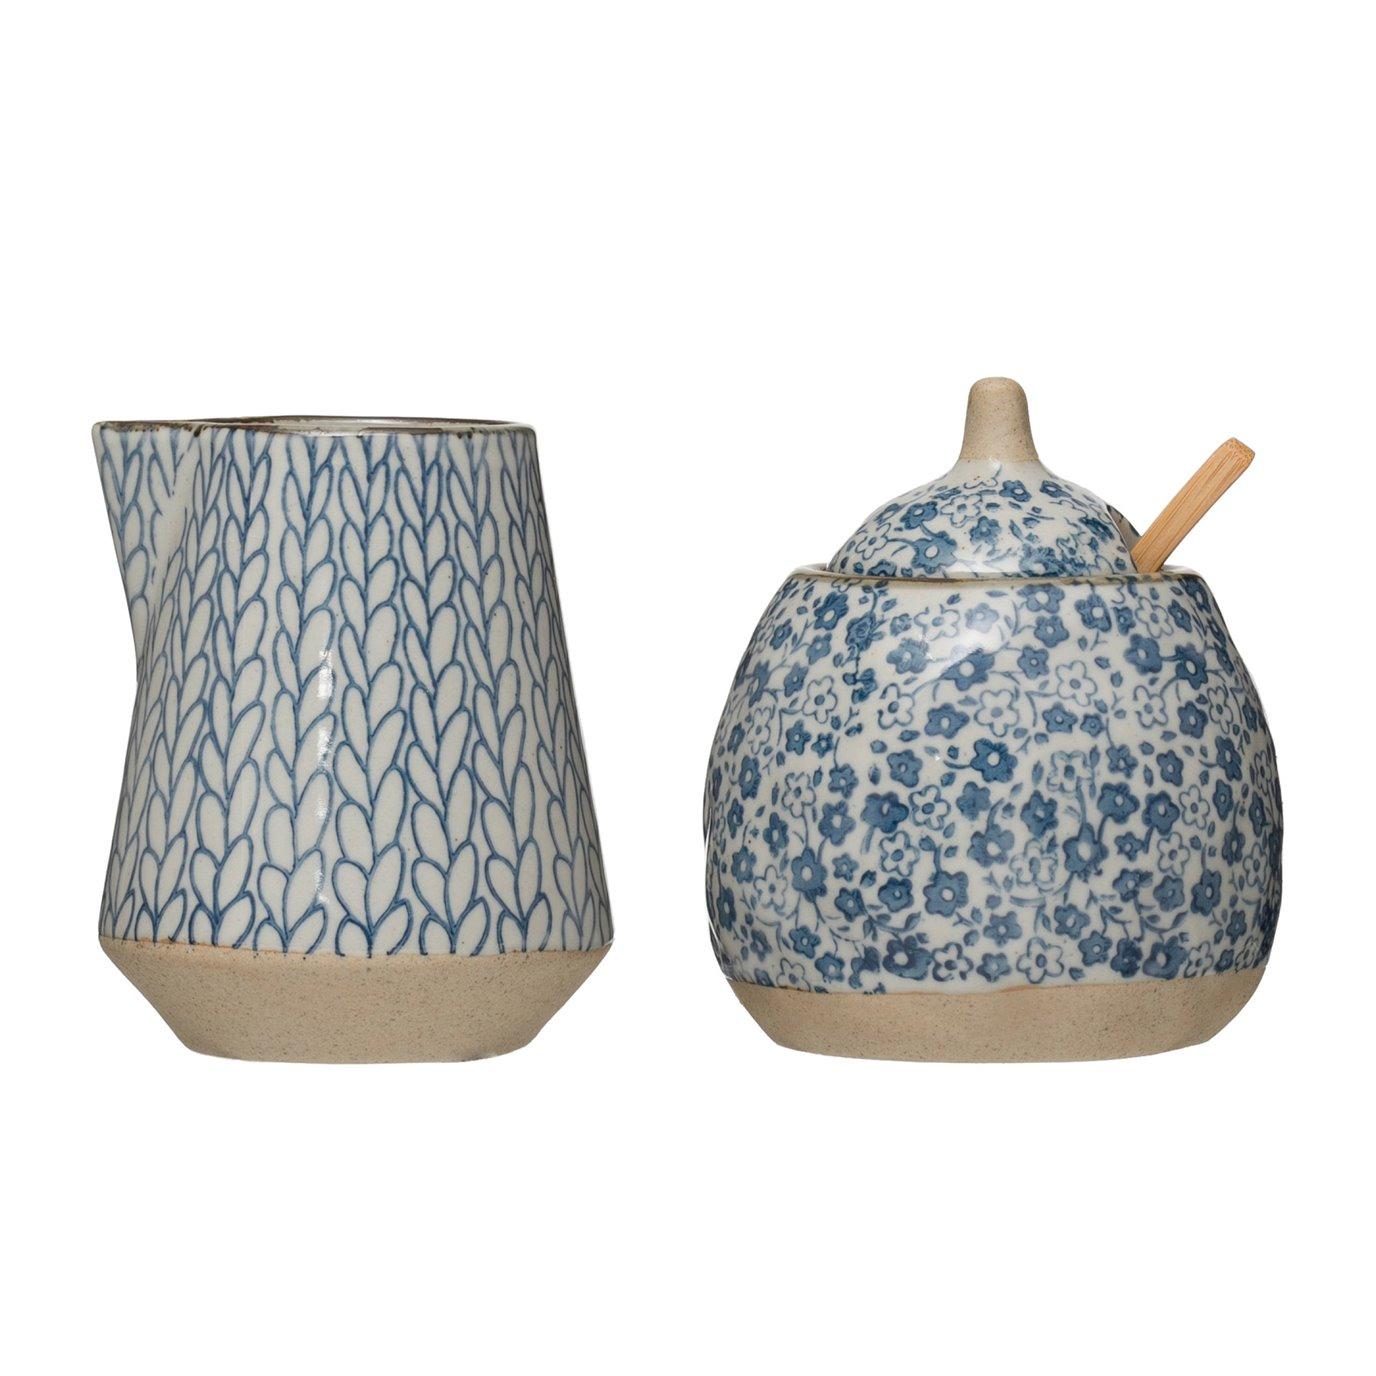 Hand-Painted Stoneware Sugar & Creamer (Set of 2 Pieces)